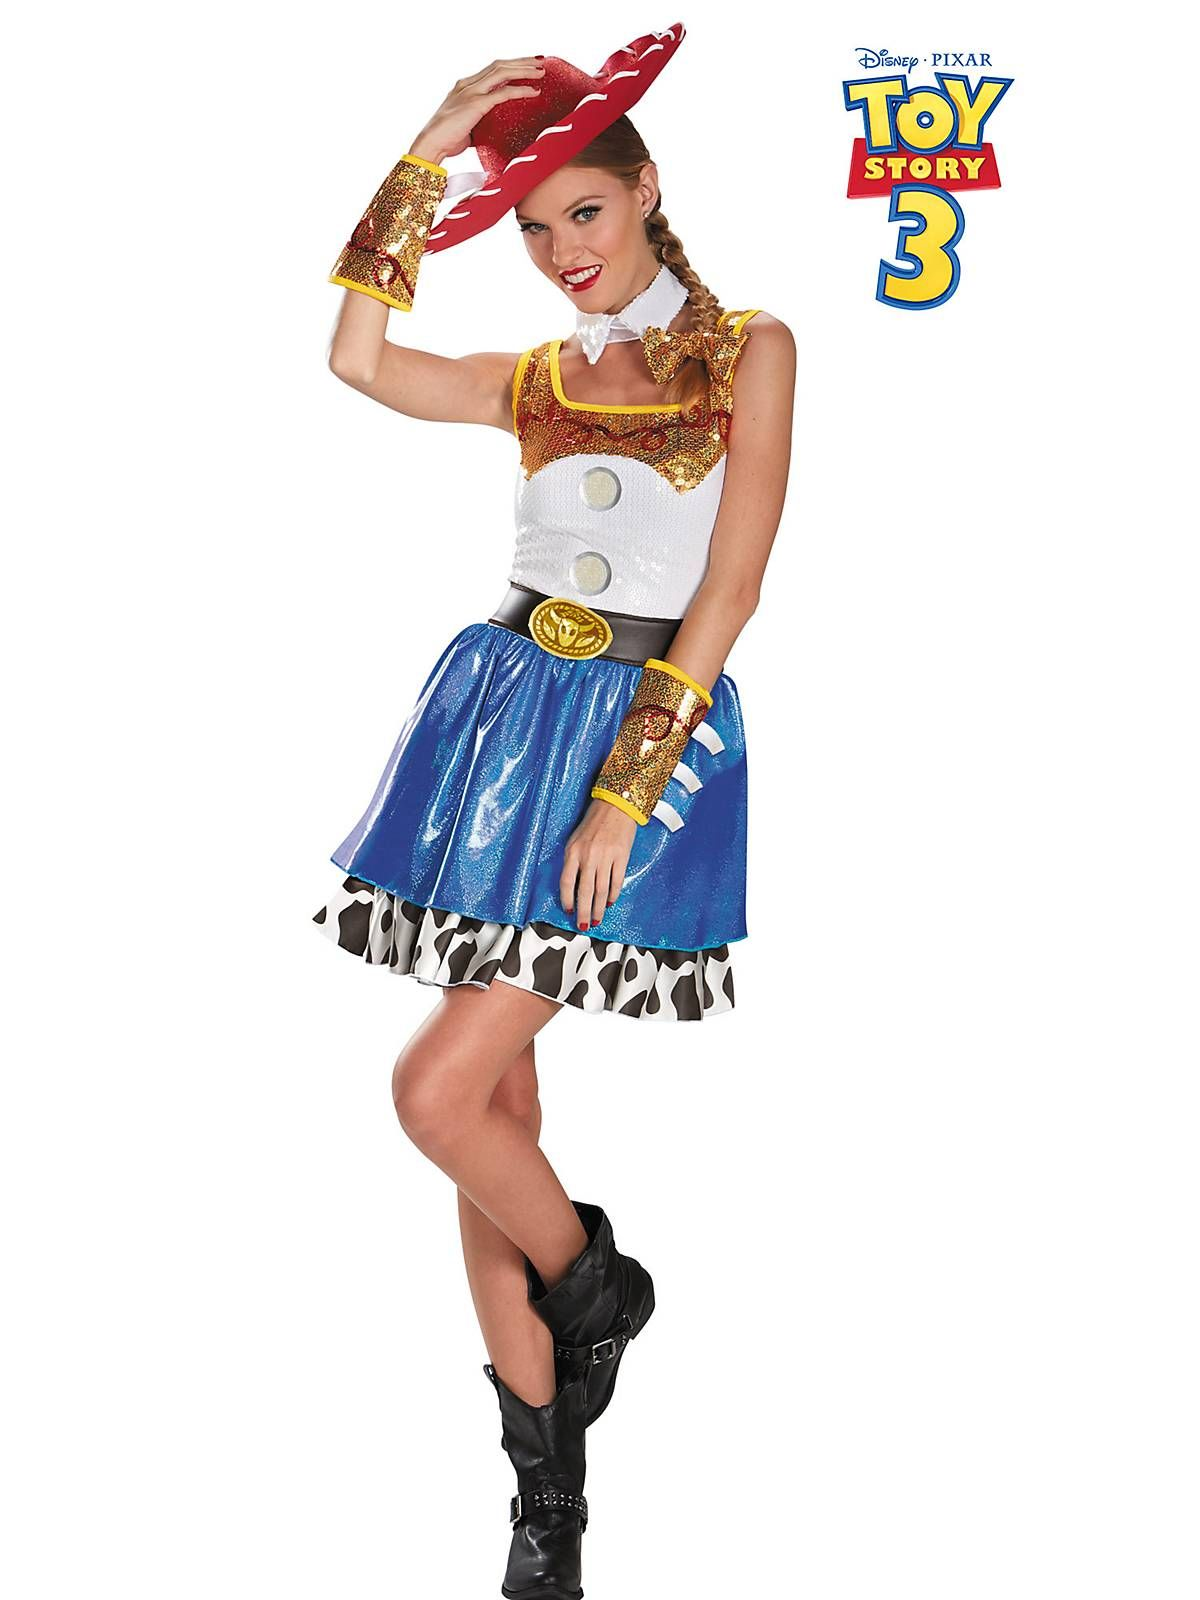 jessie glam adult costume wholesale disney pixar s toy story rh pinterest com disney pixar halloween costumes mr fredrickson disney pixar costumes